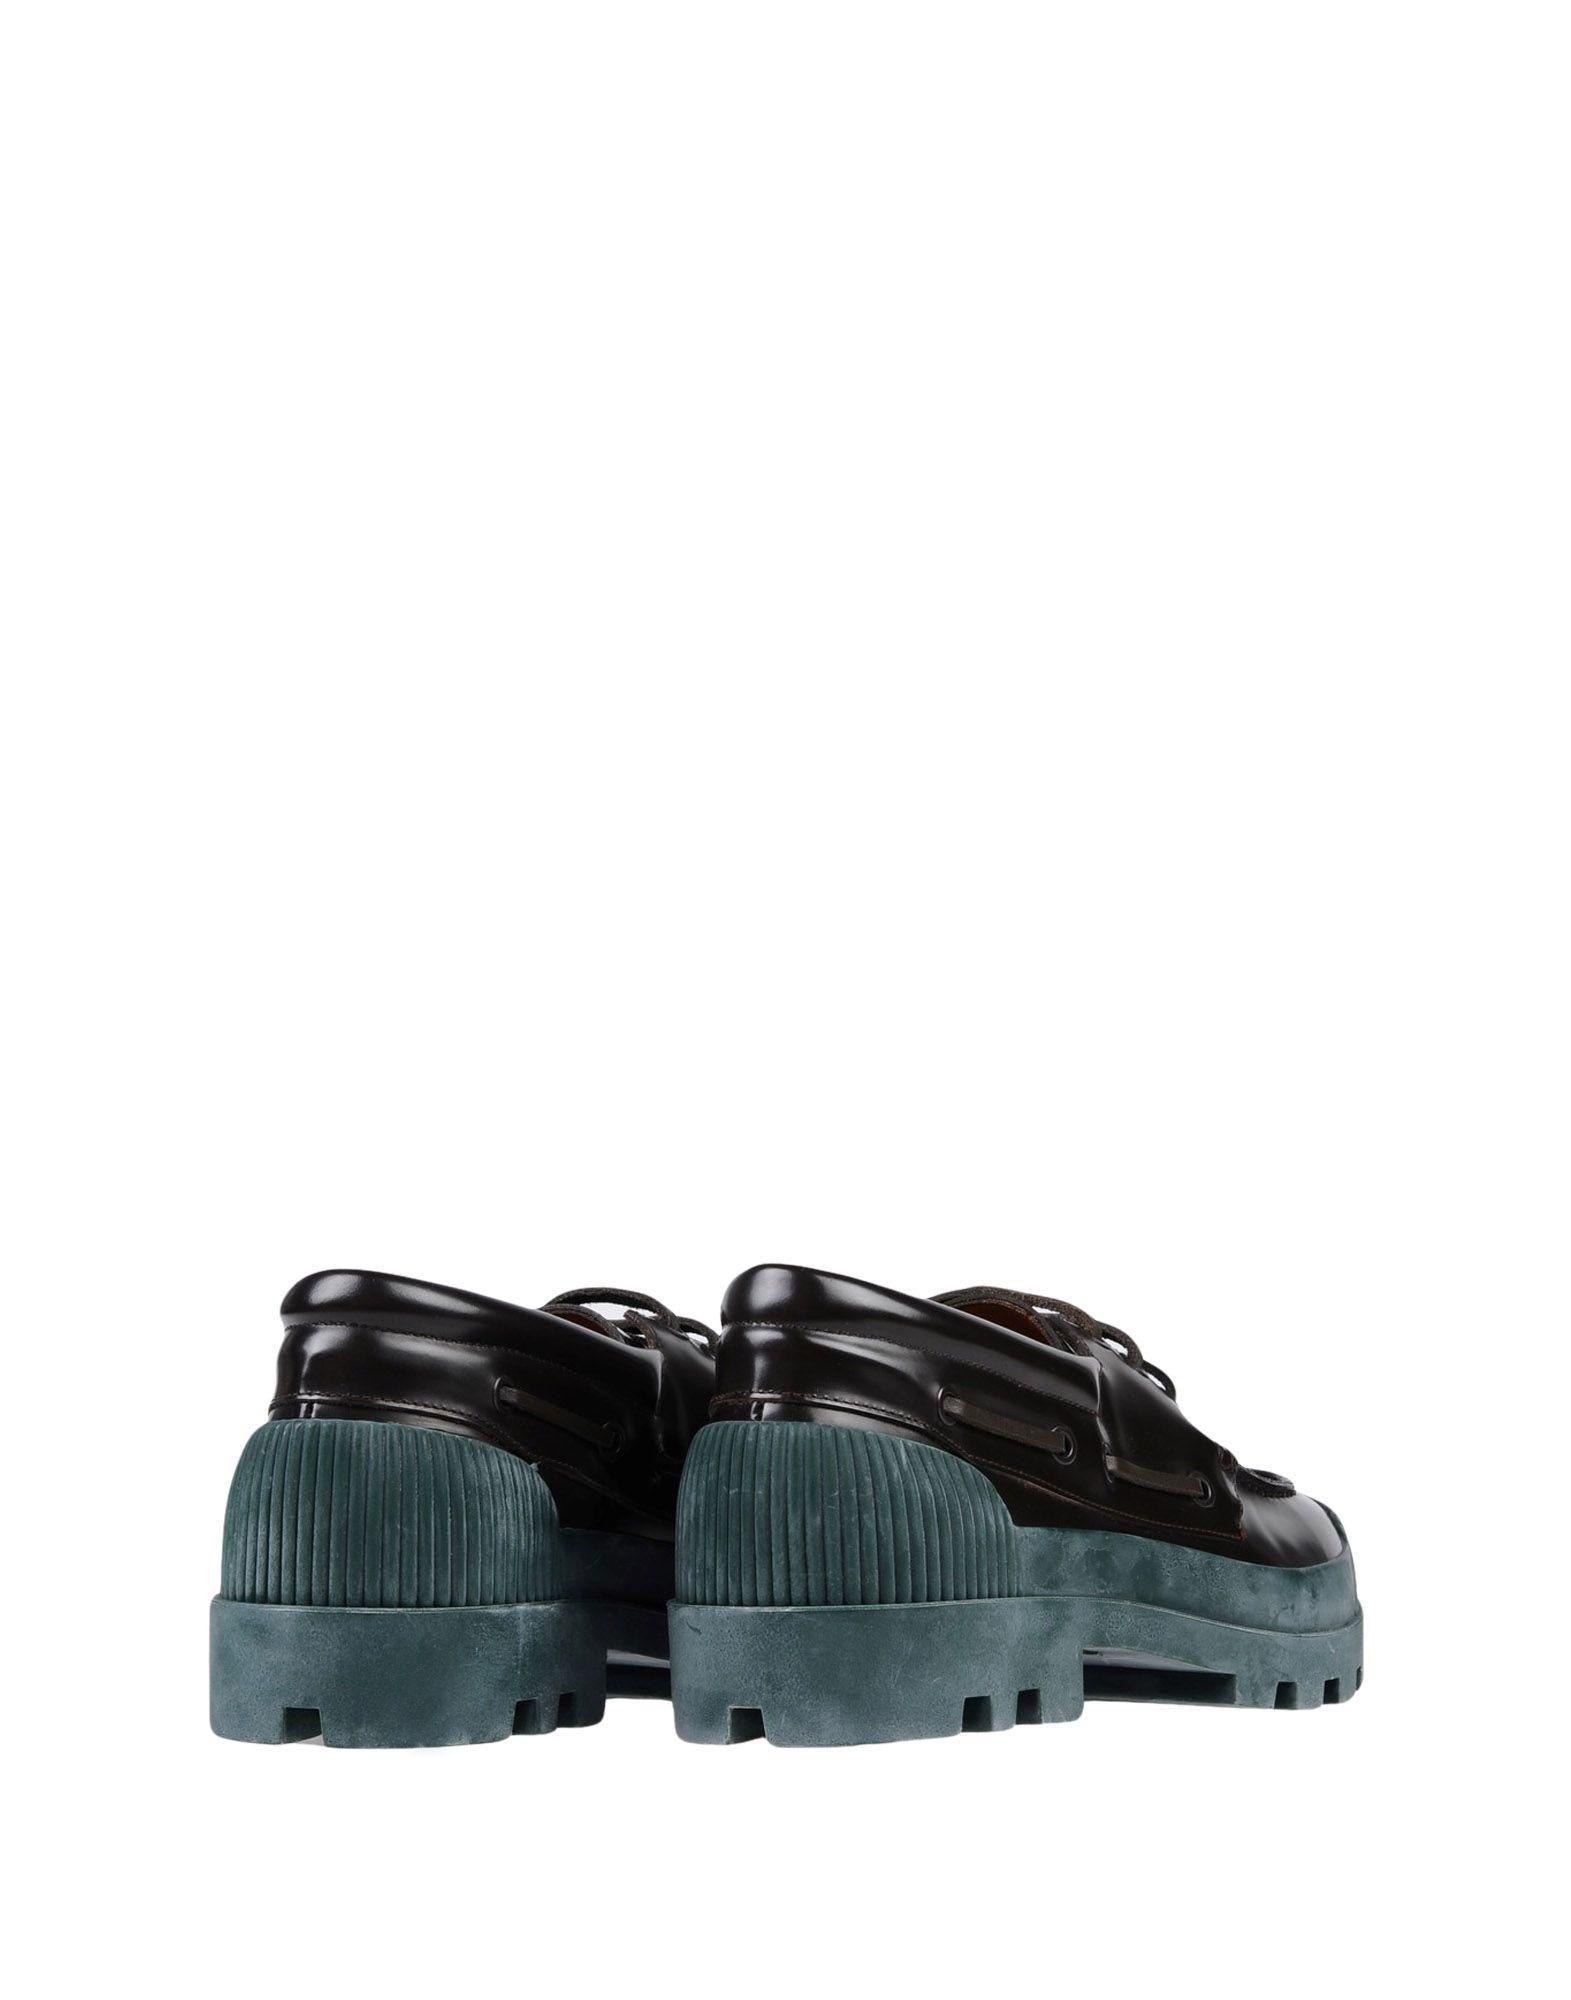 Acne Studios Schnürschuhe Herren  Schuhe 11399563FC Gute Qualität beliebte Schuhe  807111